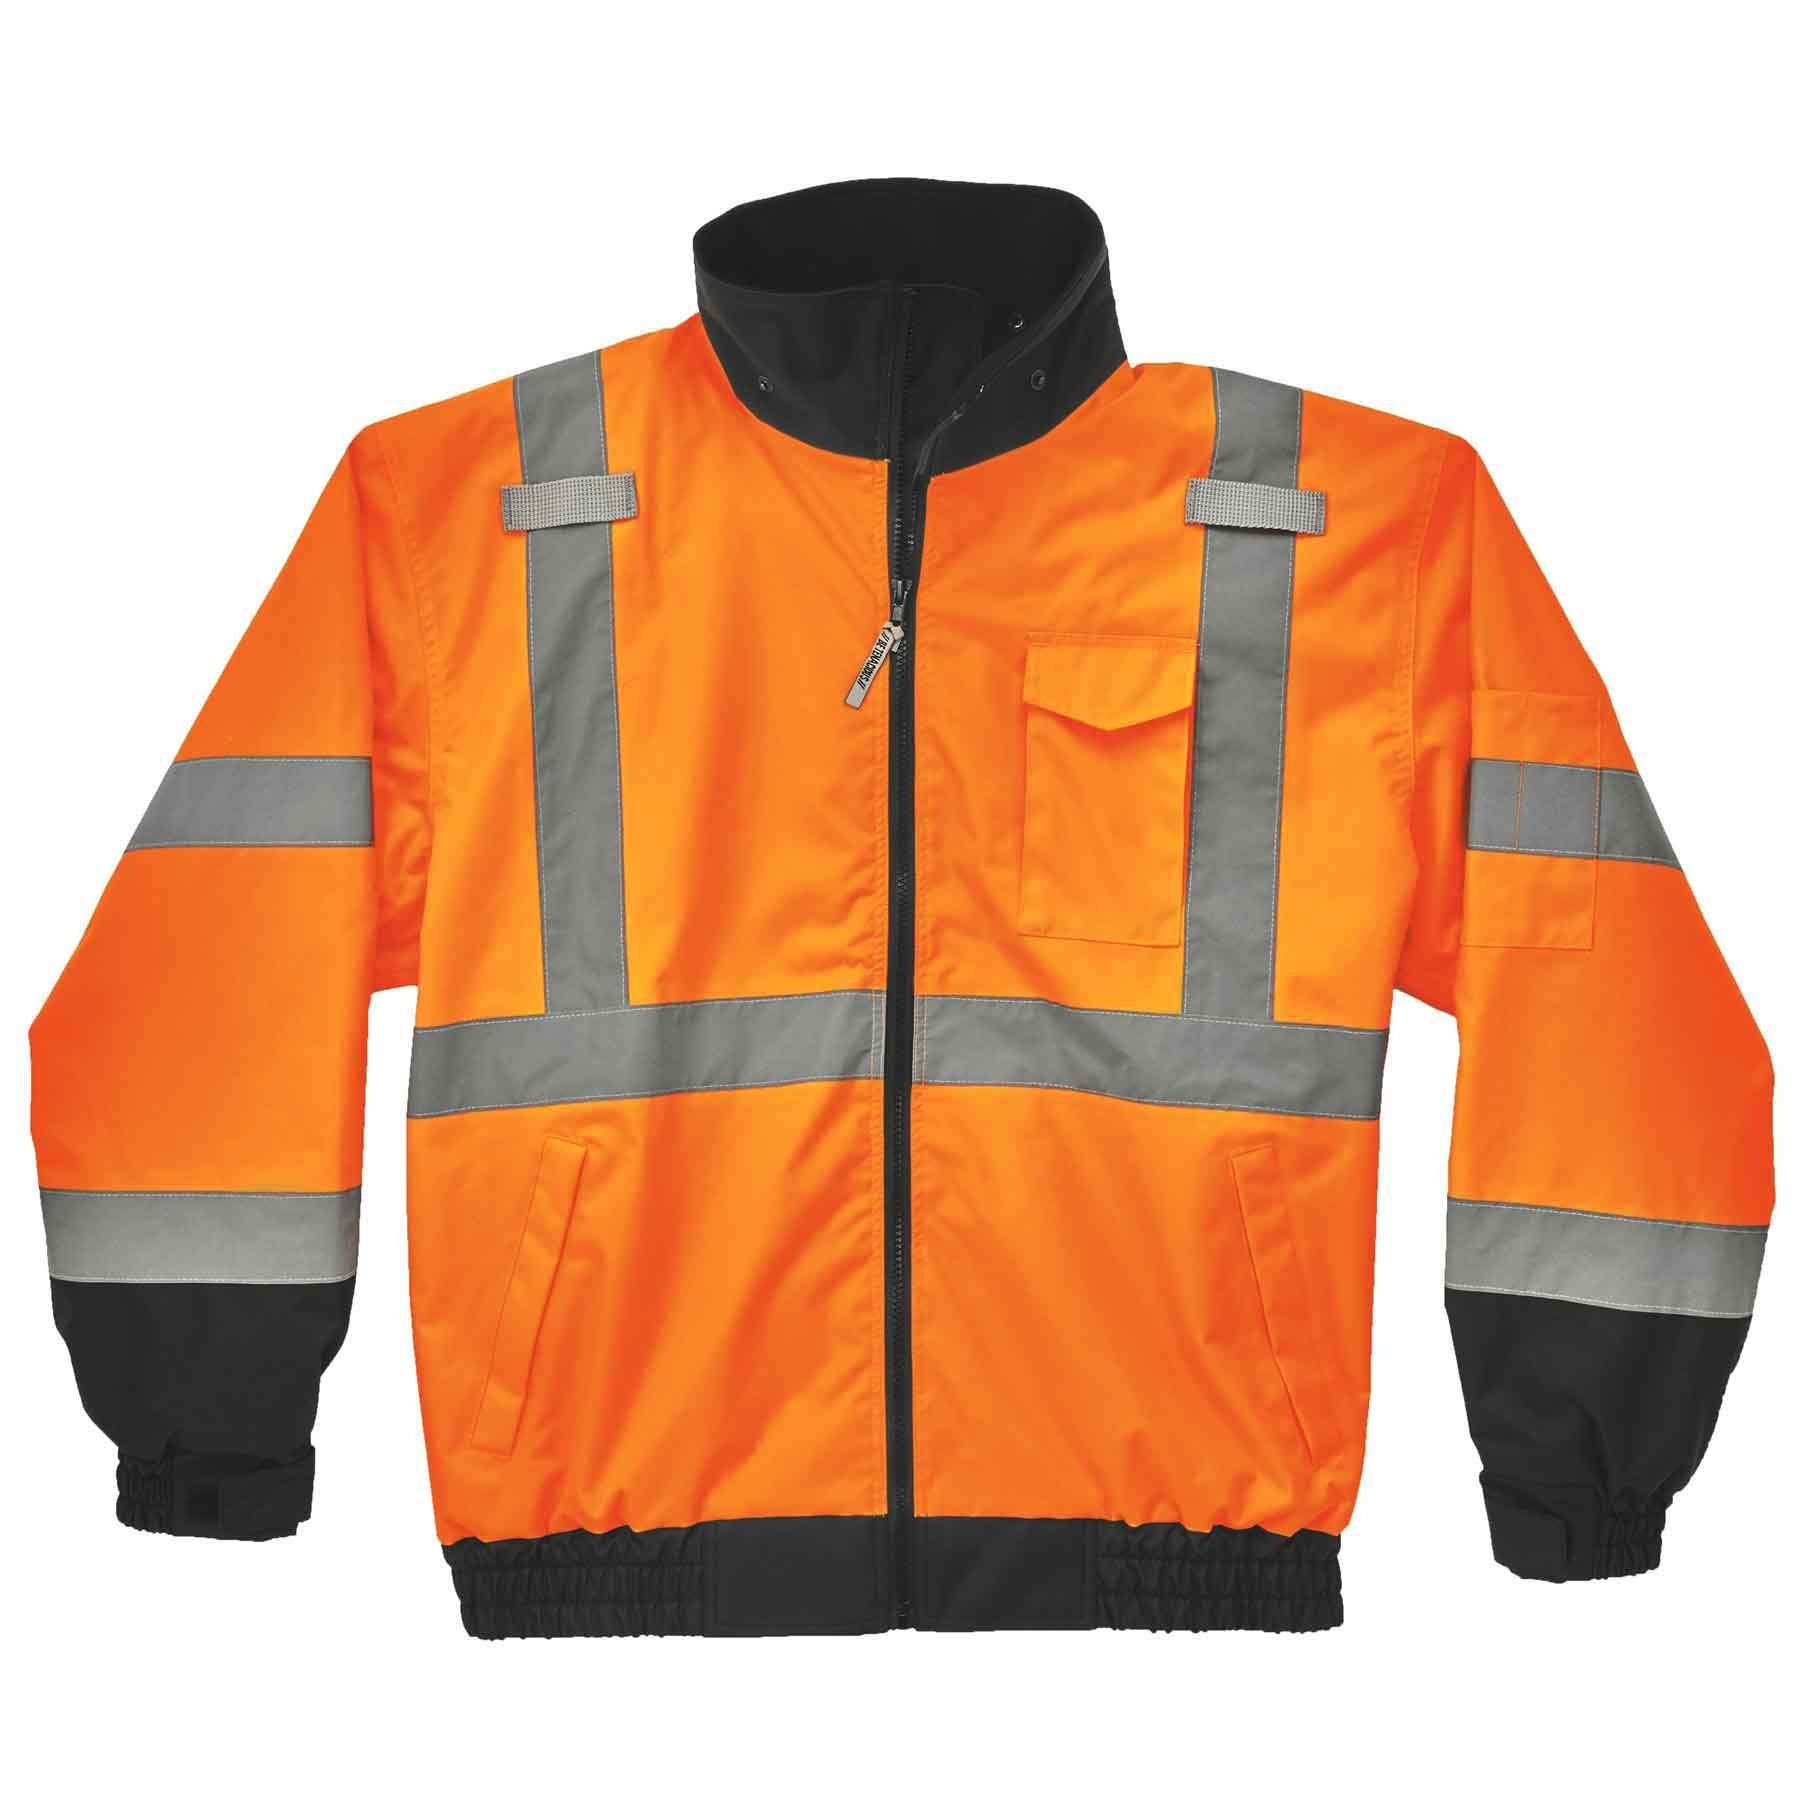 Ergodyne GloWear 8379 ANSI High Visibility Orange Thermal Bomber Jacket, XL